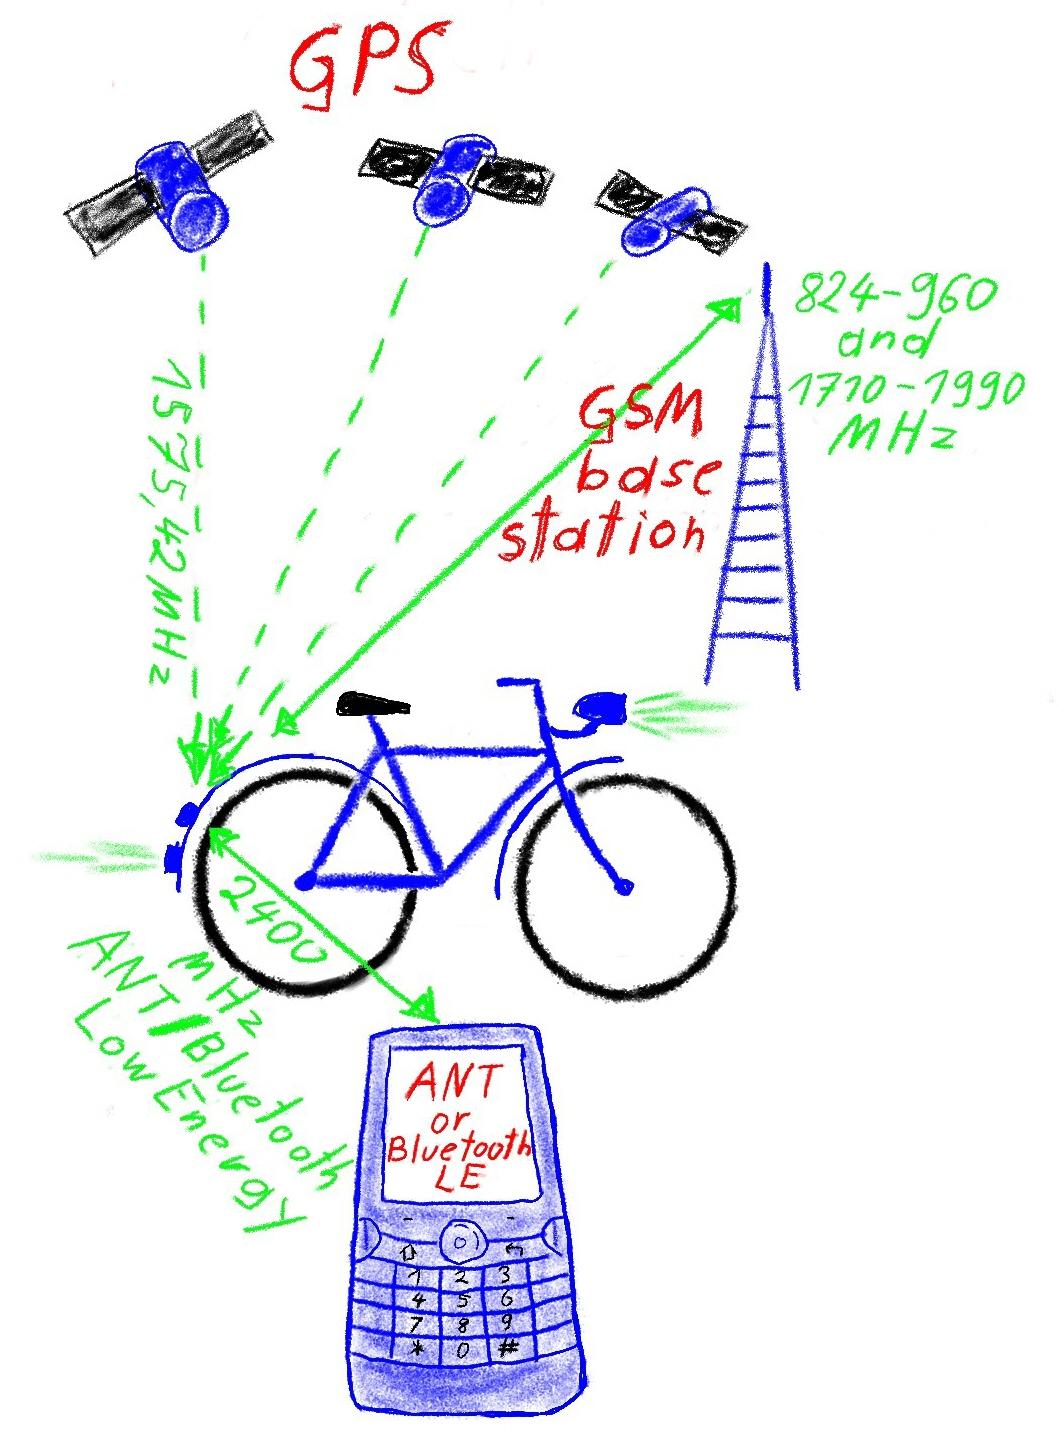 http://www.gsm-modem.de/M2M/wp-content/uploads/2011/05/smartphone-bike-GPS-GSM-tracker.jpg